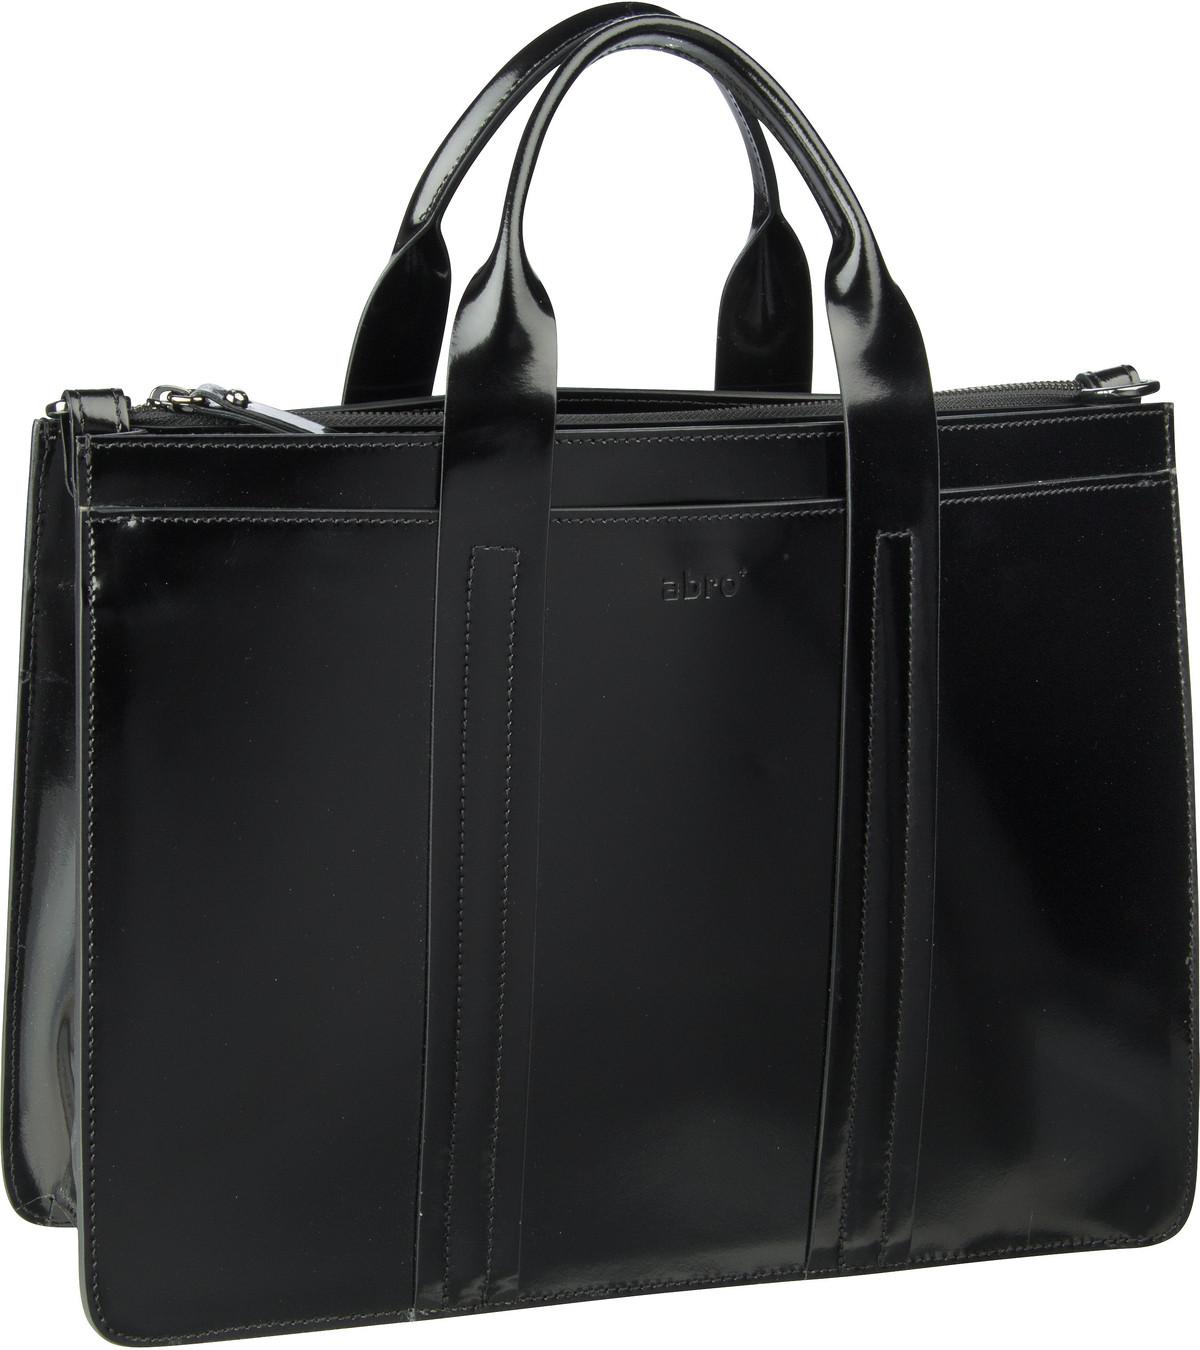 Handtasche Specchio 28648 Black/Guncolor